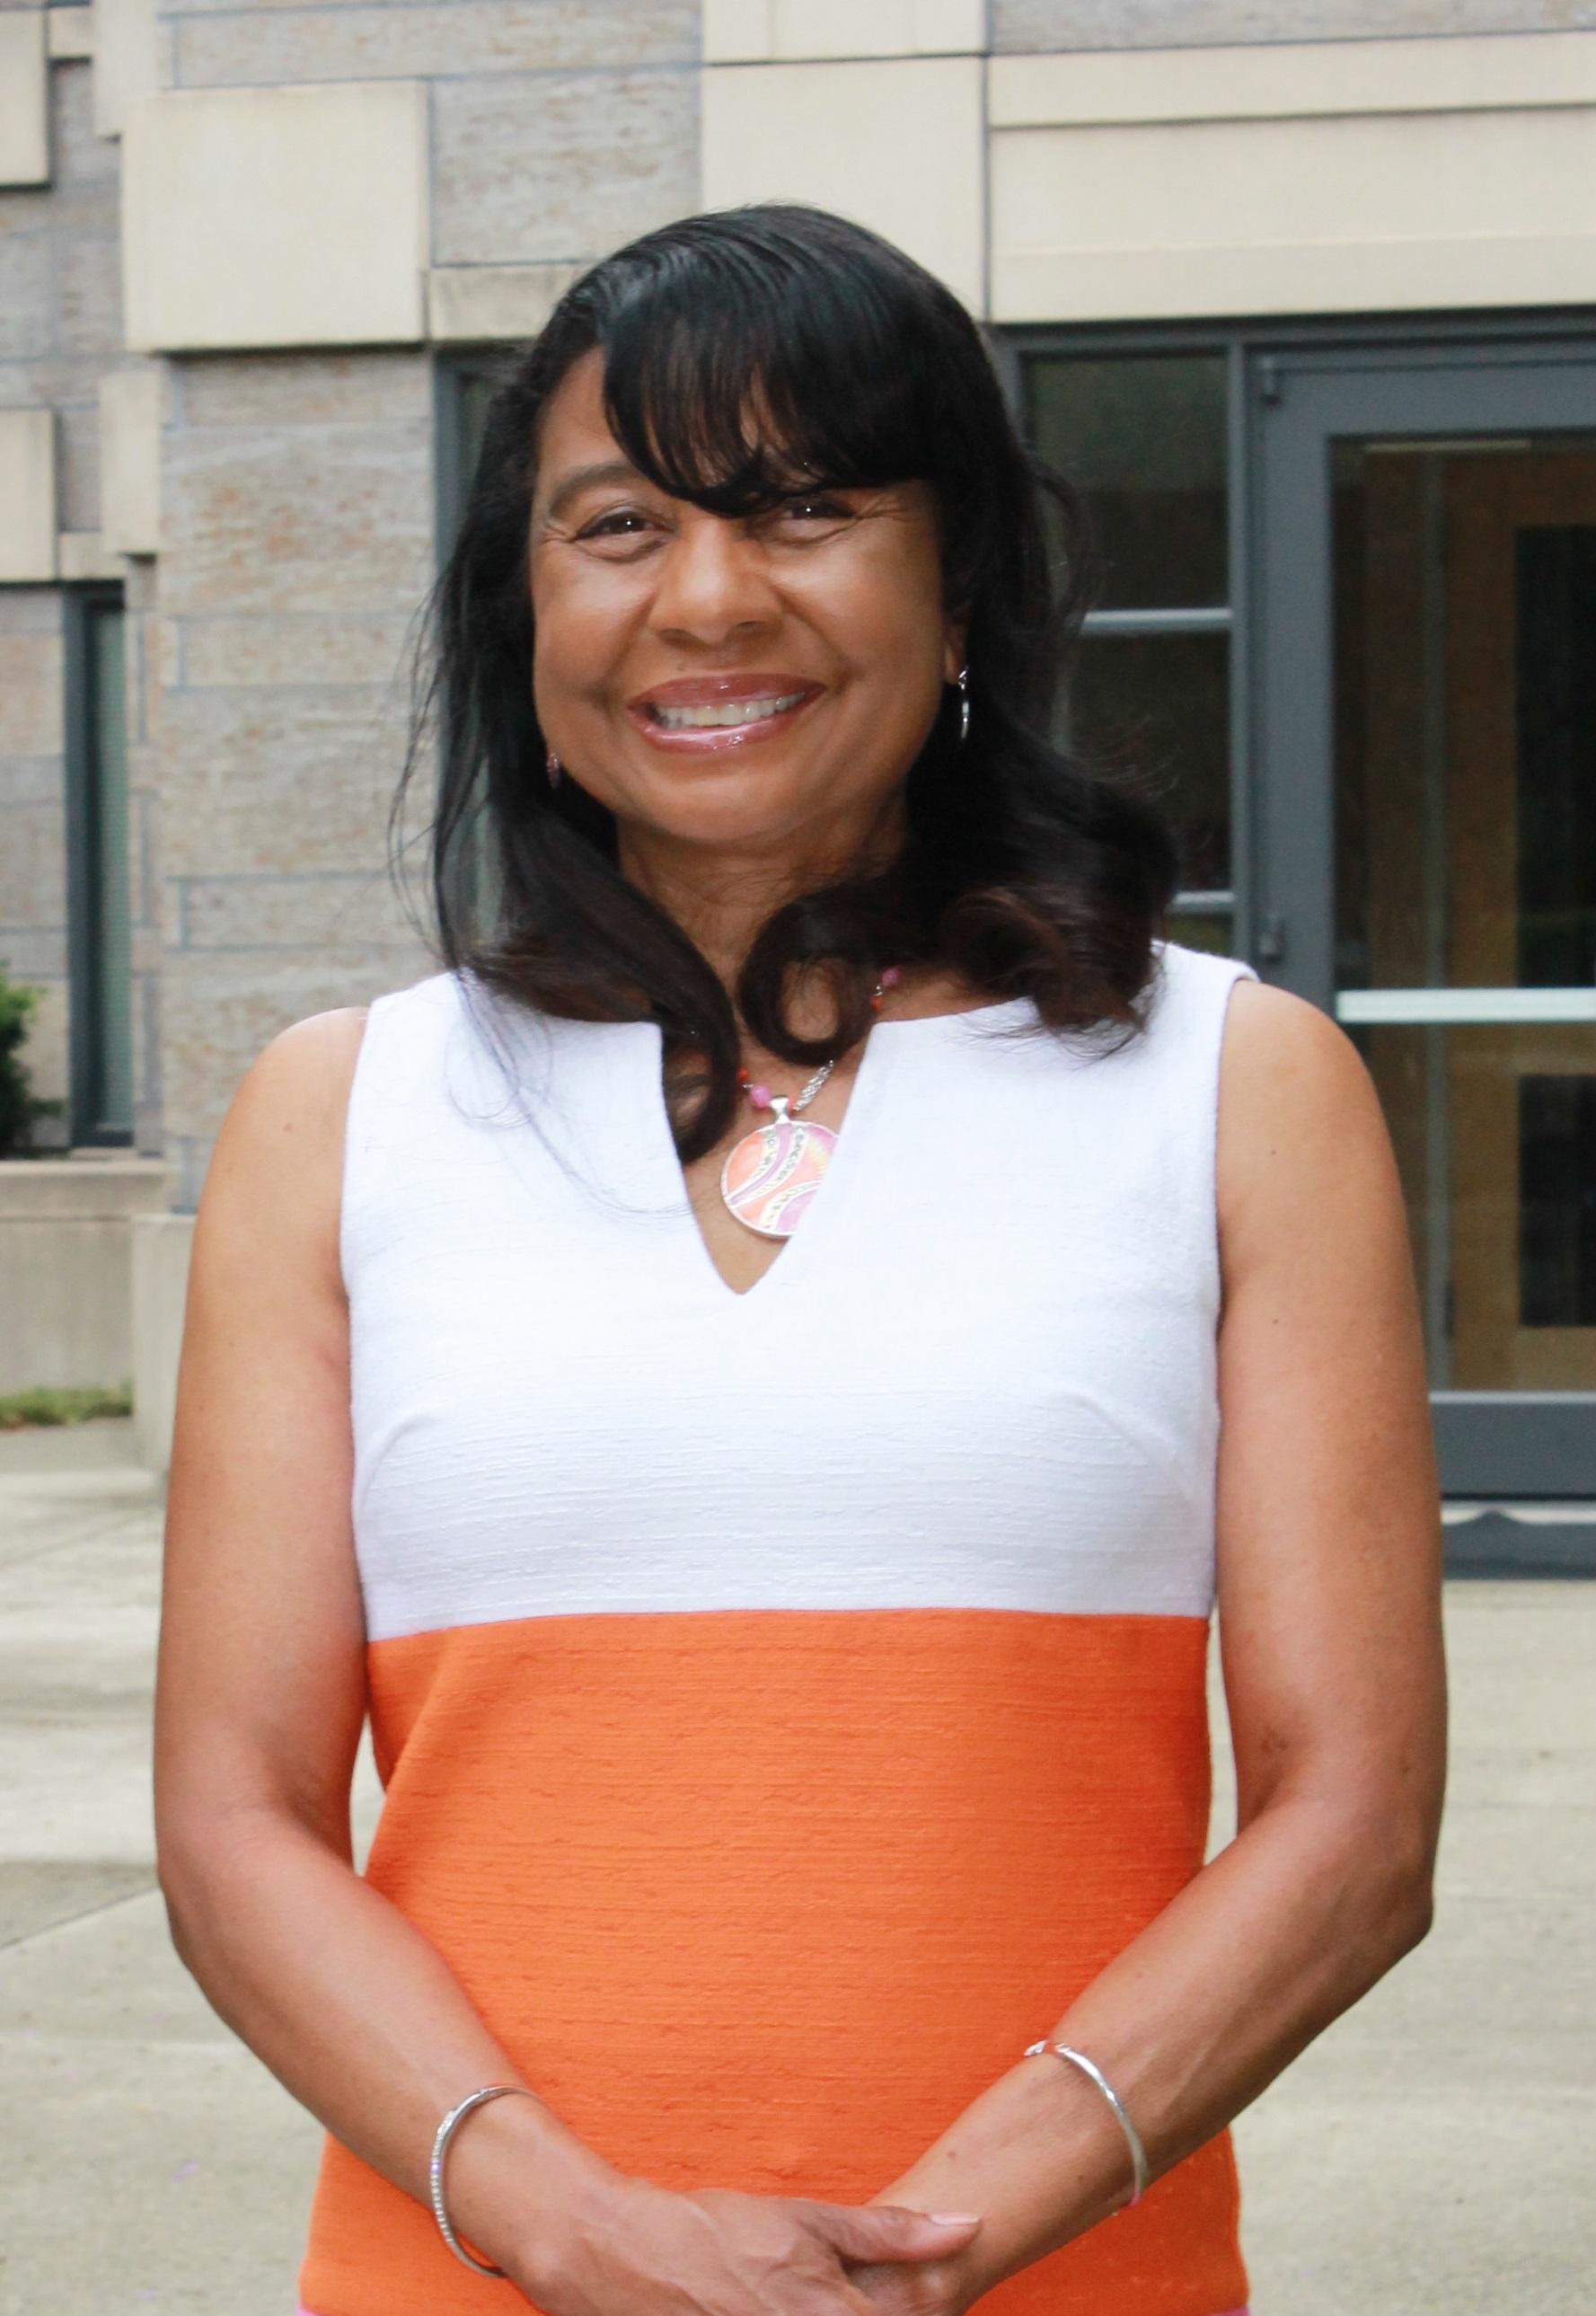 Photo of Linda Burton with long black hair and white and orange dress.